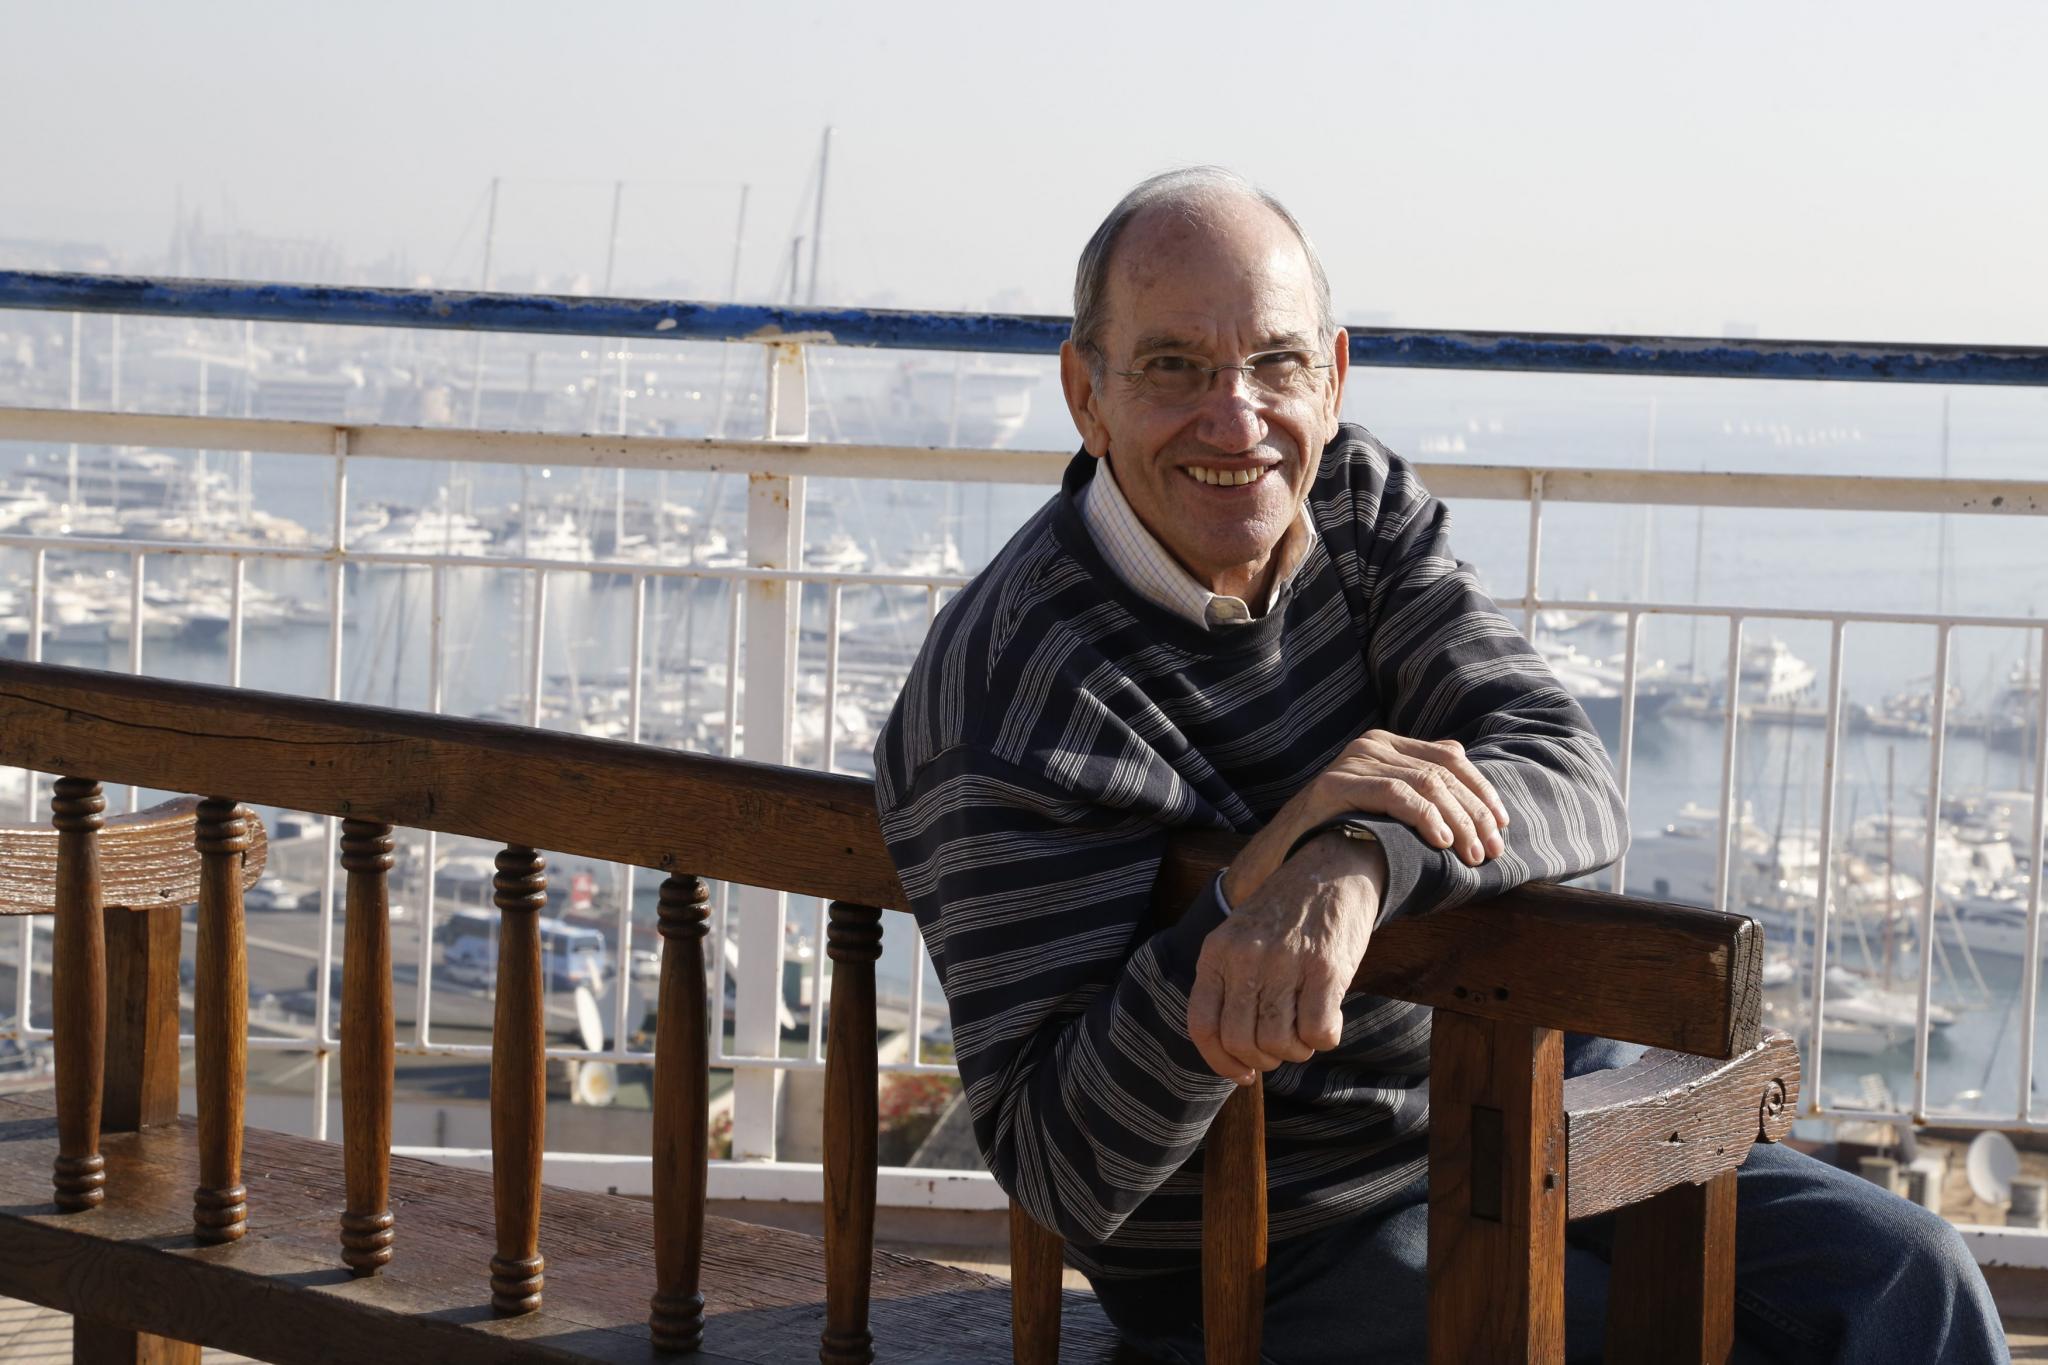 Simon Andreu